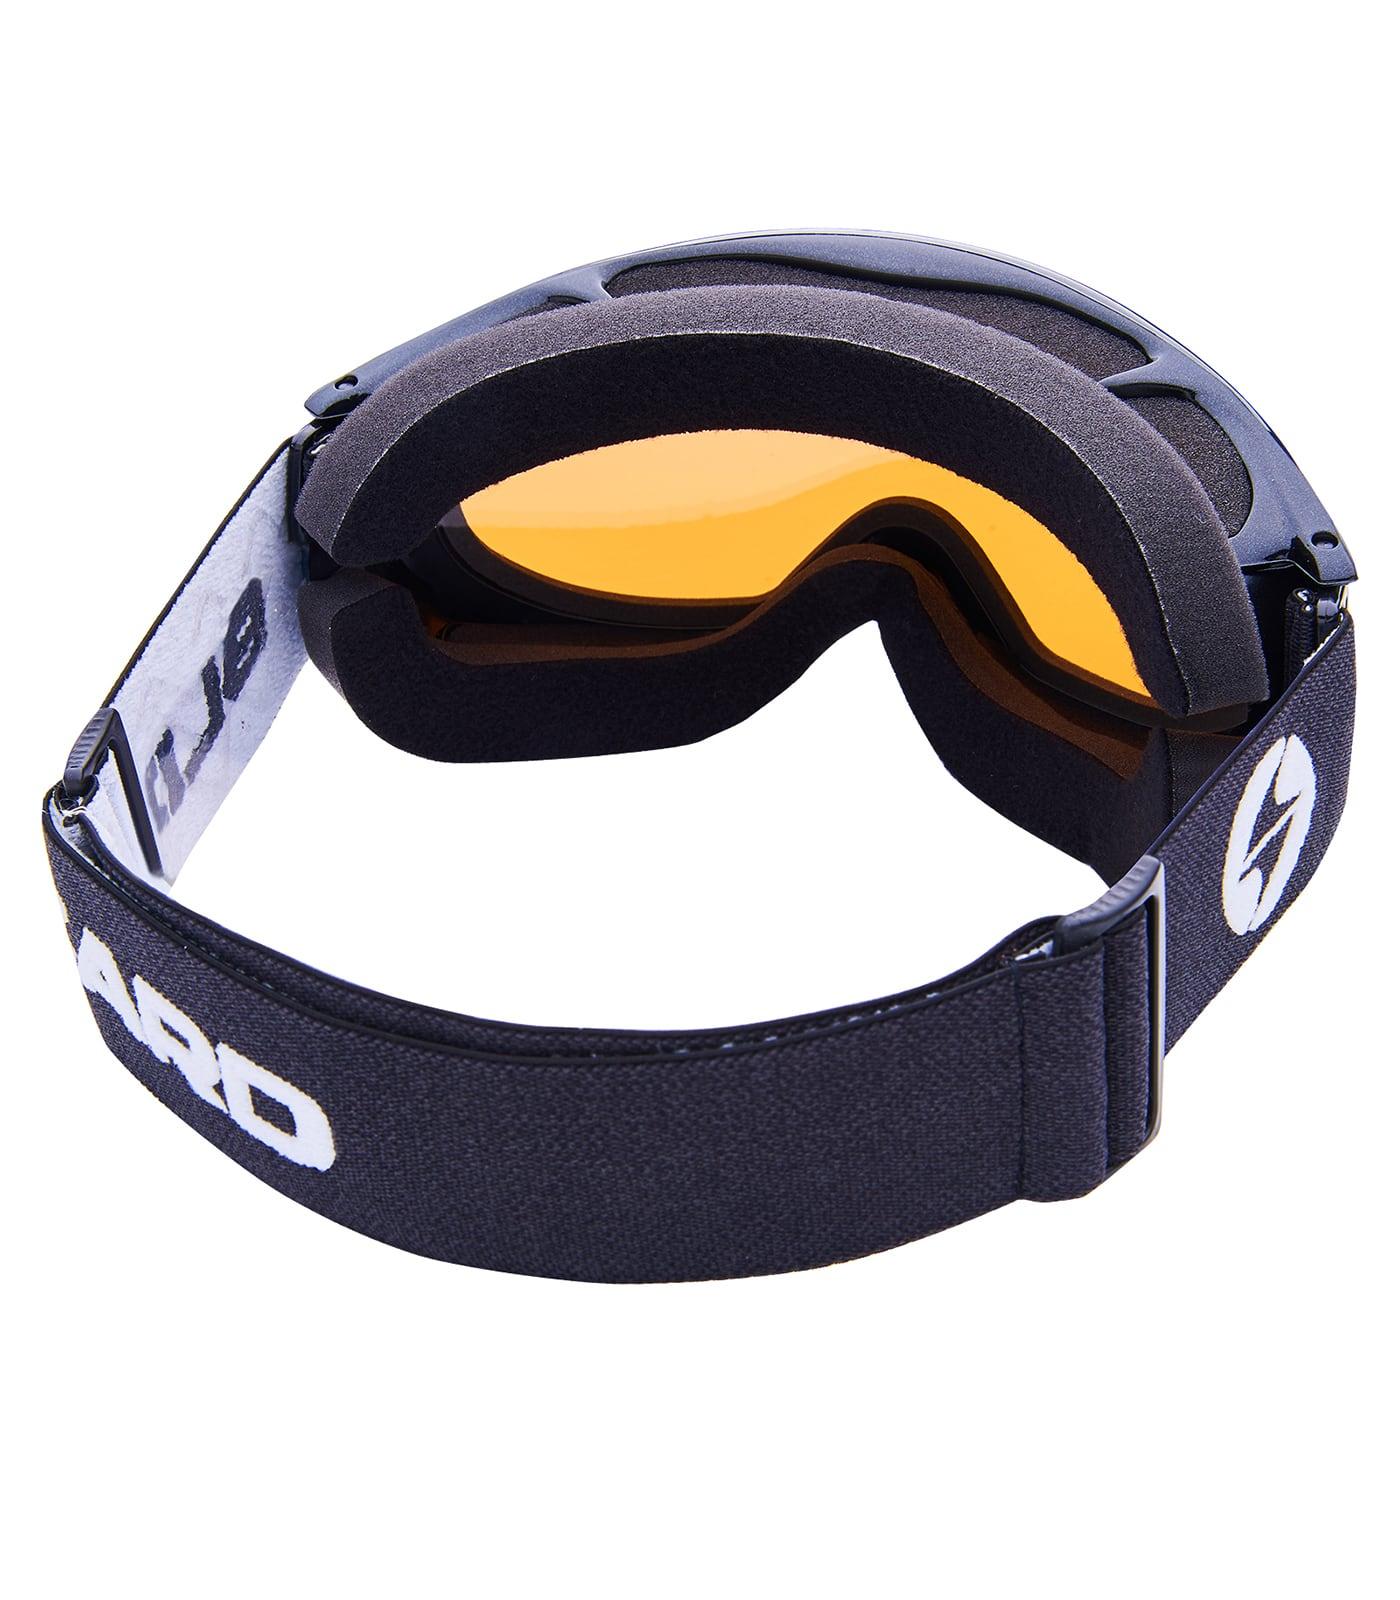 BLIZ Ski Gog. 905 MDAVZO, black metallic, amber2, silver mirror